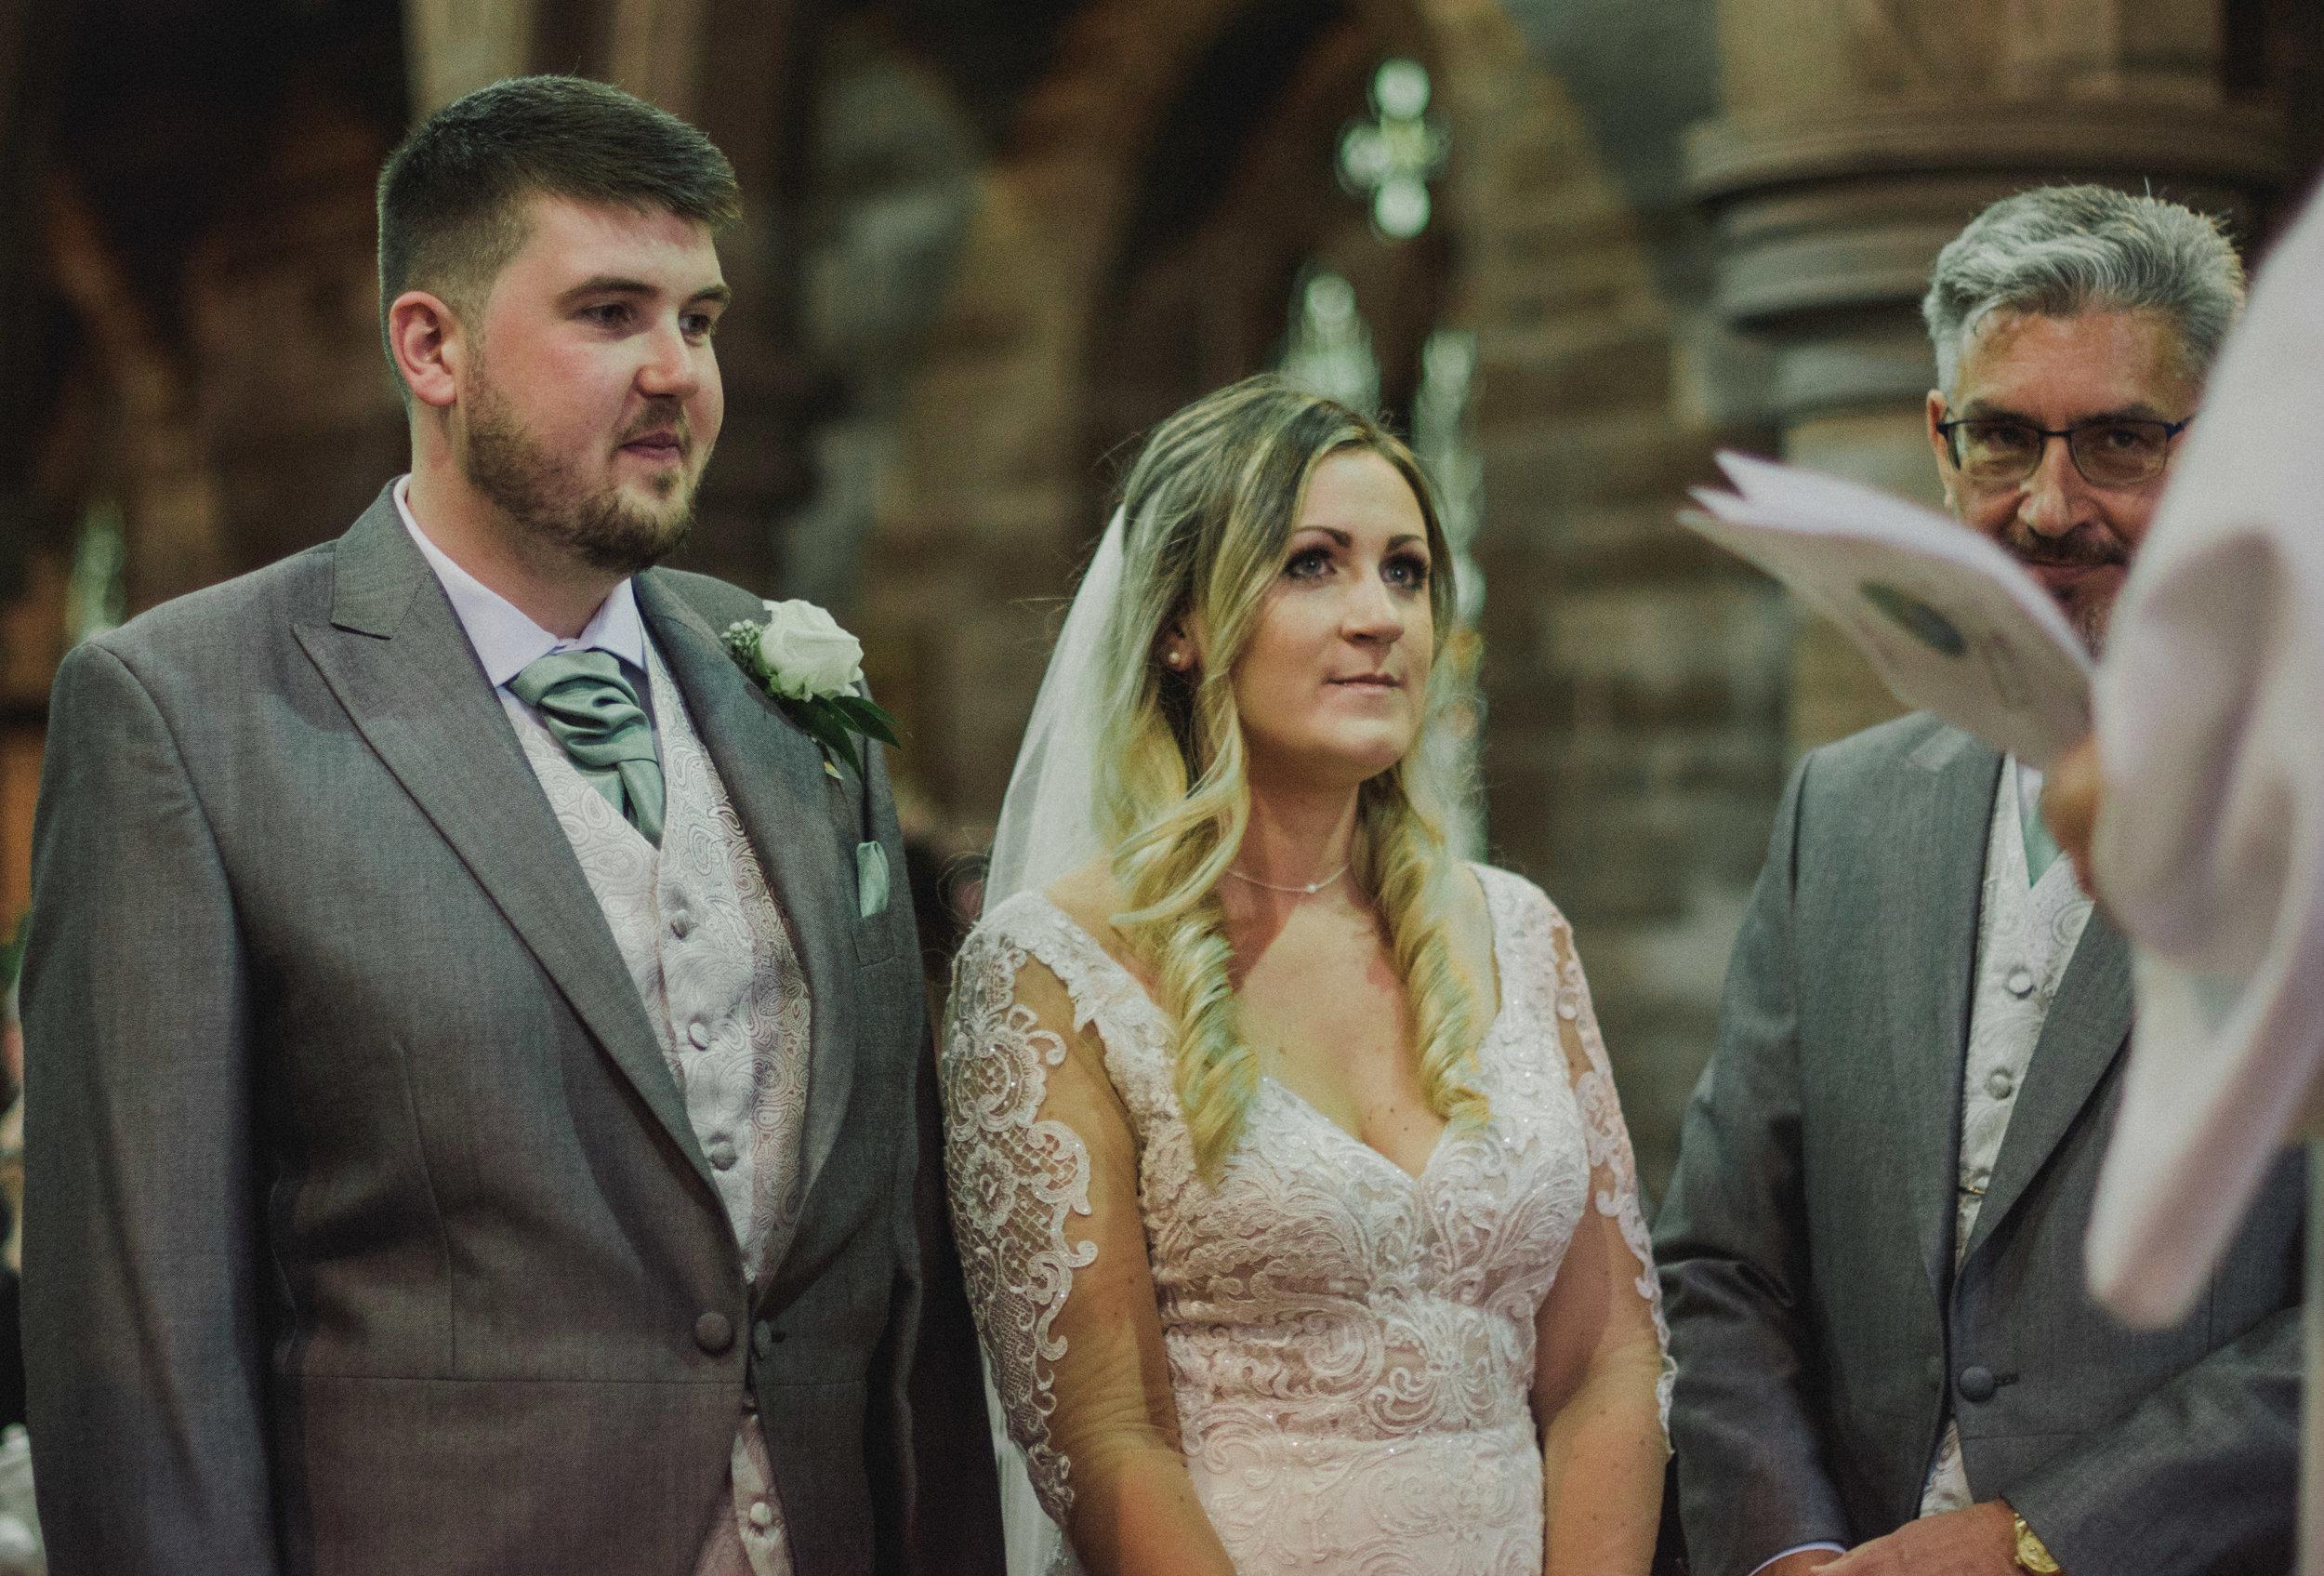 Cheshire wedding Photographer wedding photographer engagement photographer carlisle wedding photographer Glasgow wedding photographer lancashire wedding photographer (1 of 1)-7.jpg